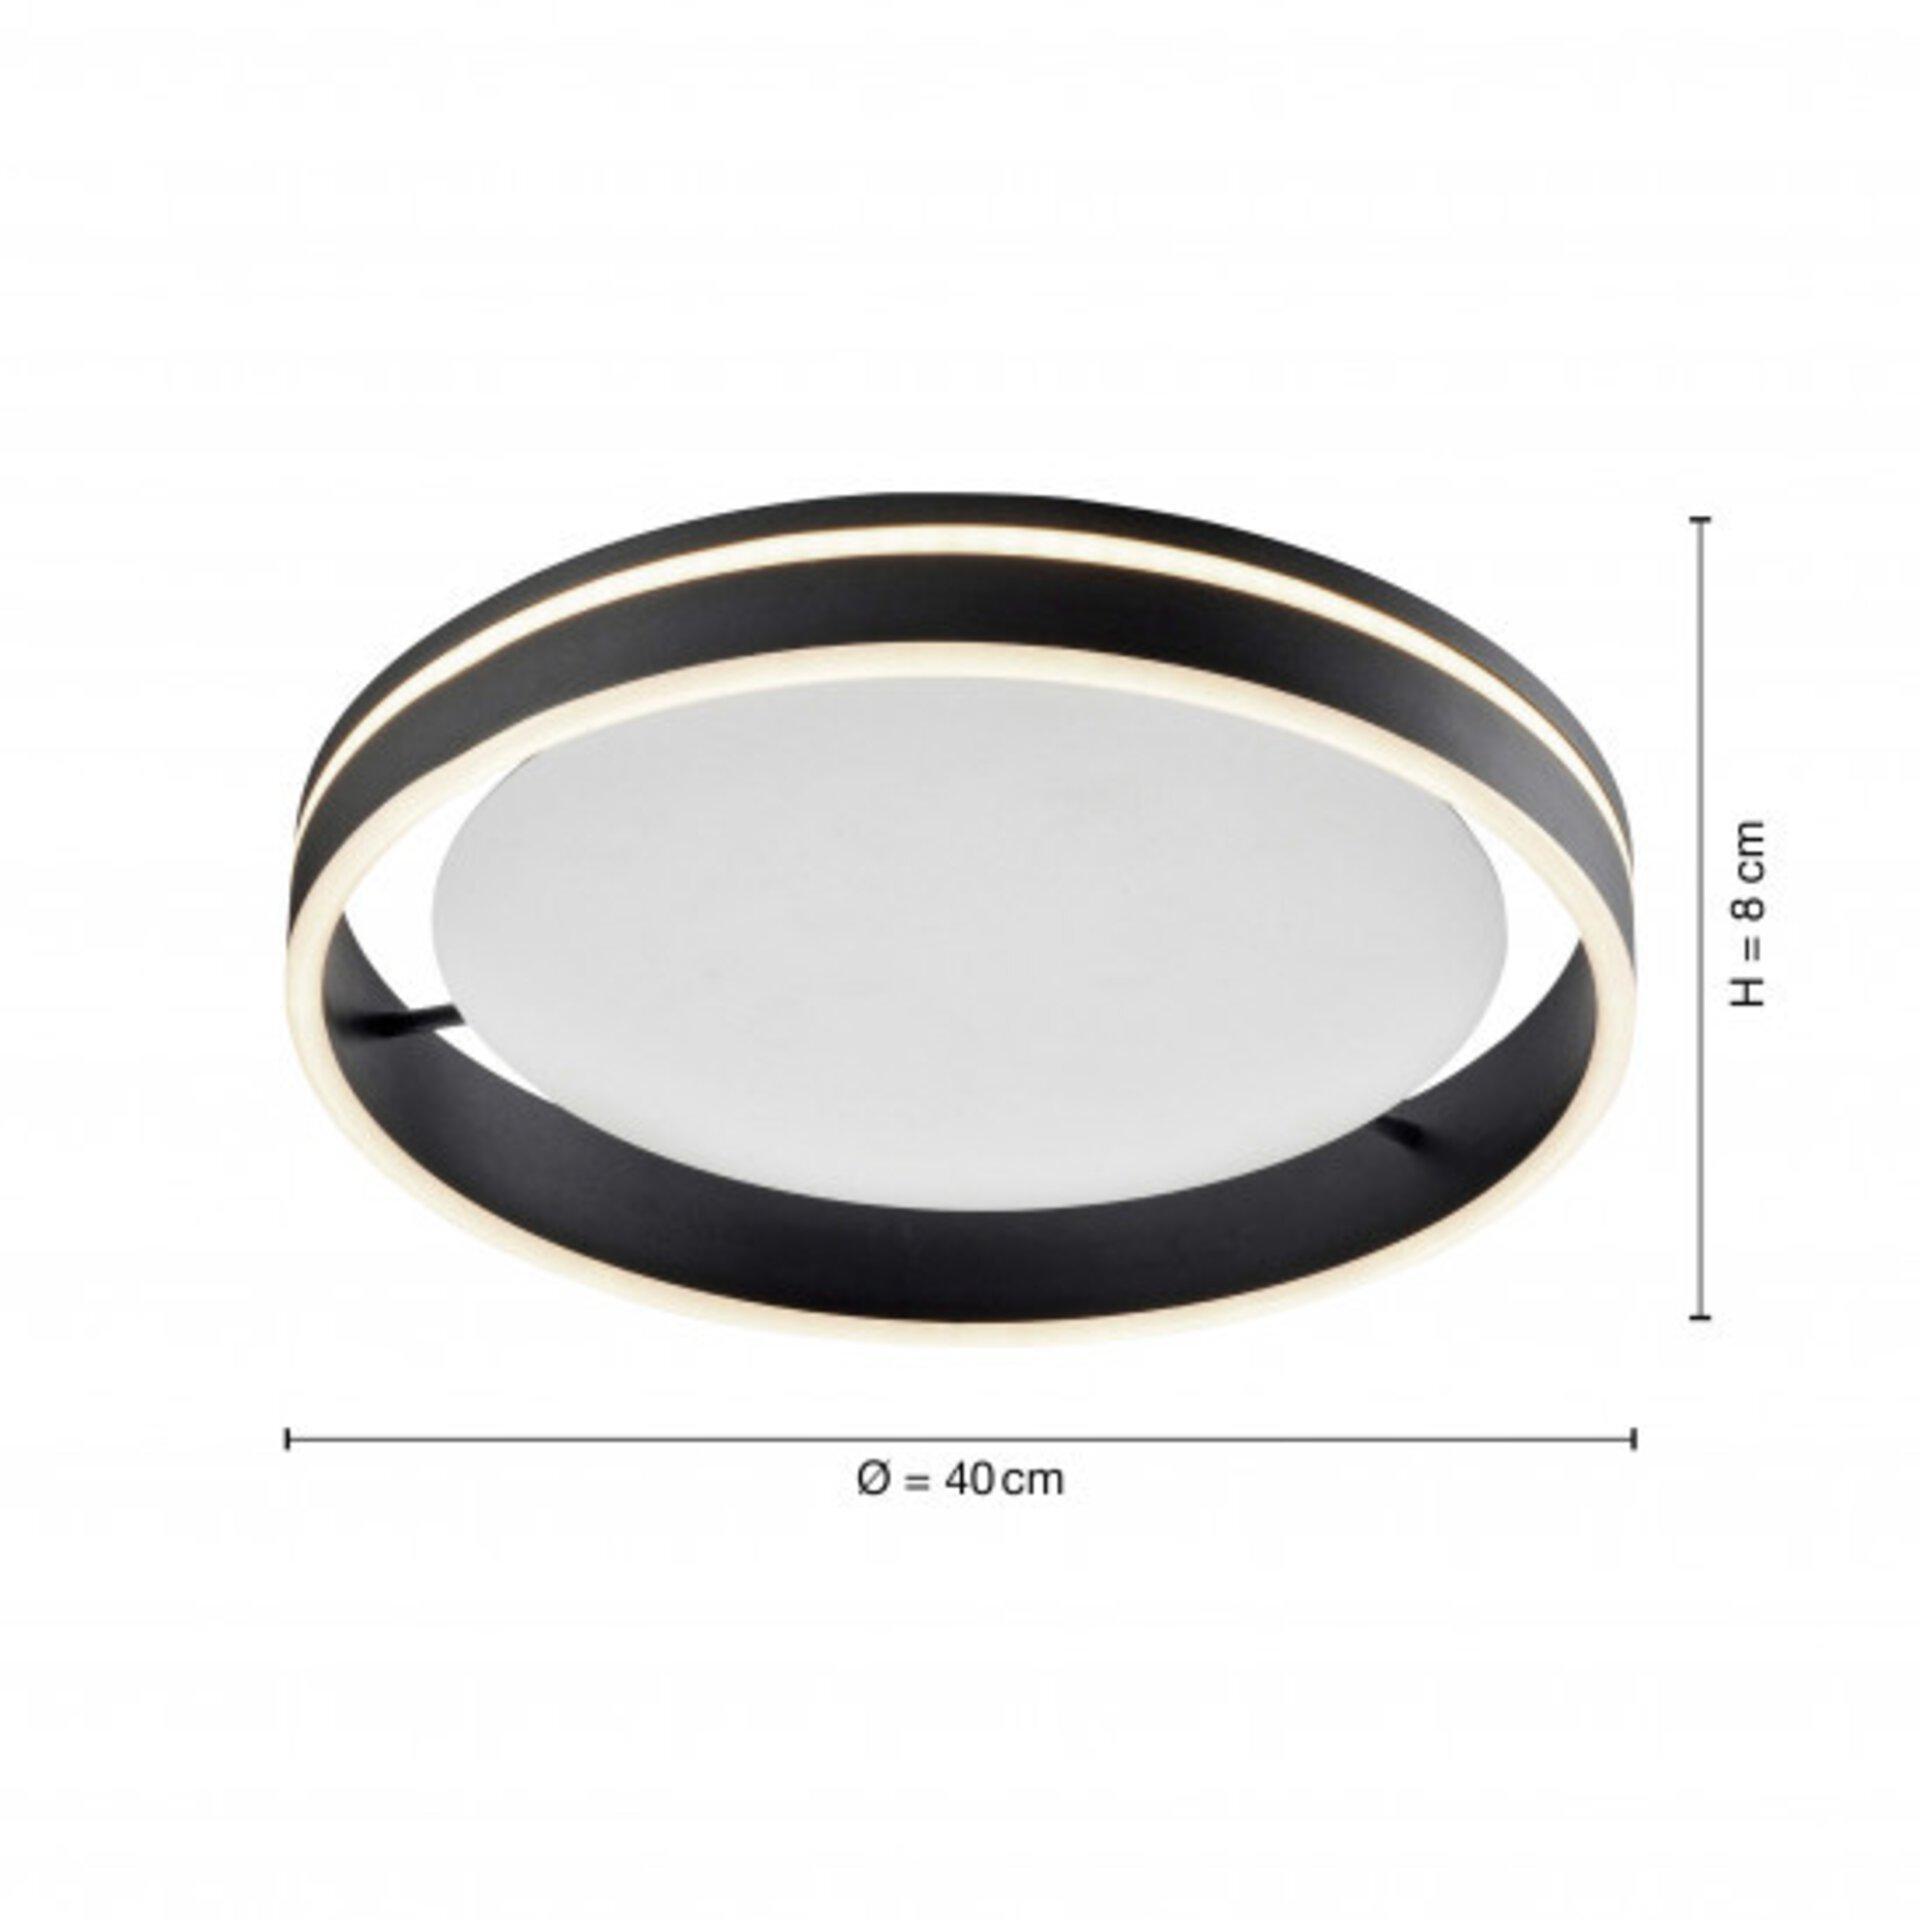 Smart-Home-Leuchten Q-VITO Paul Neuhaus Metall 40 x 8 x 40 cm